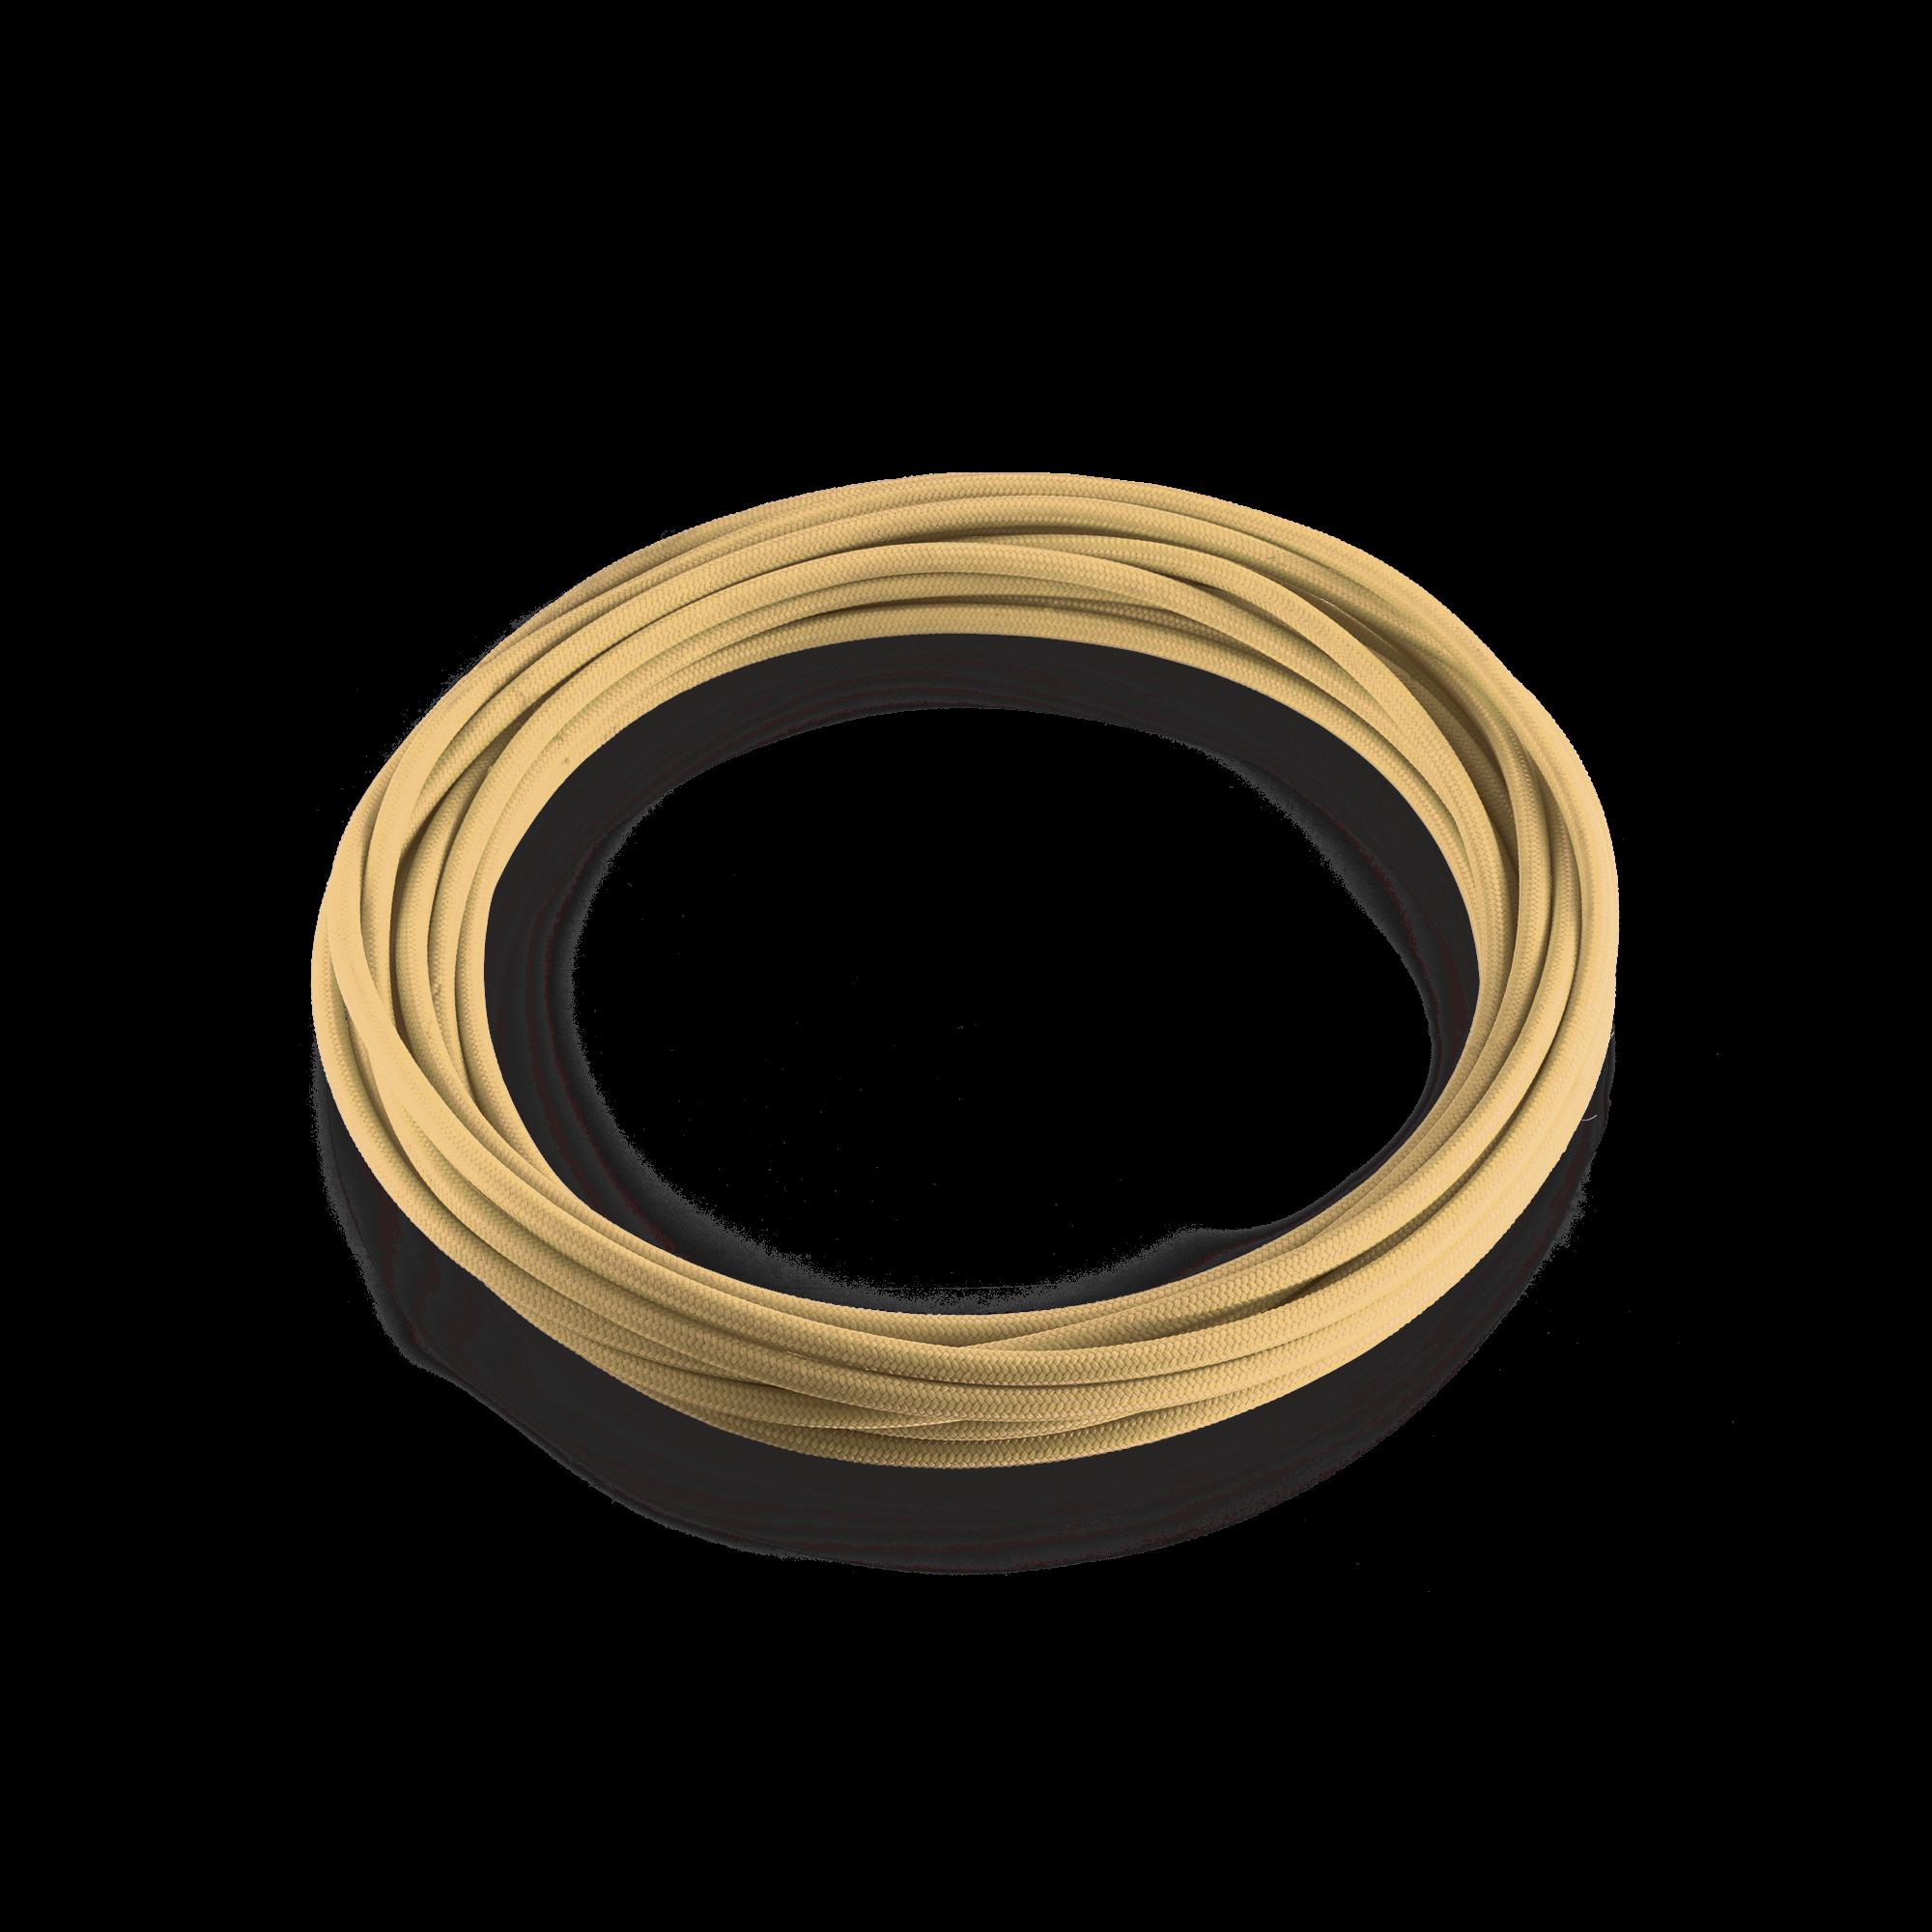 Кабель Ideal Lux Cavo Tessuto 249162, коричневый, текстиль - фото 1